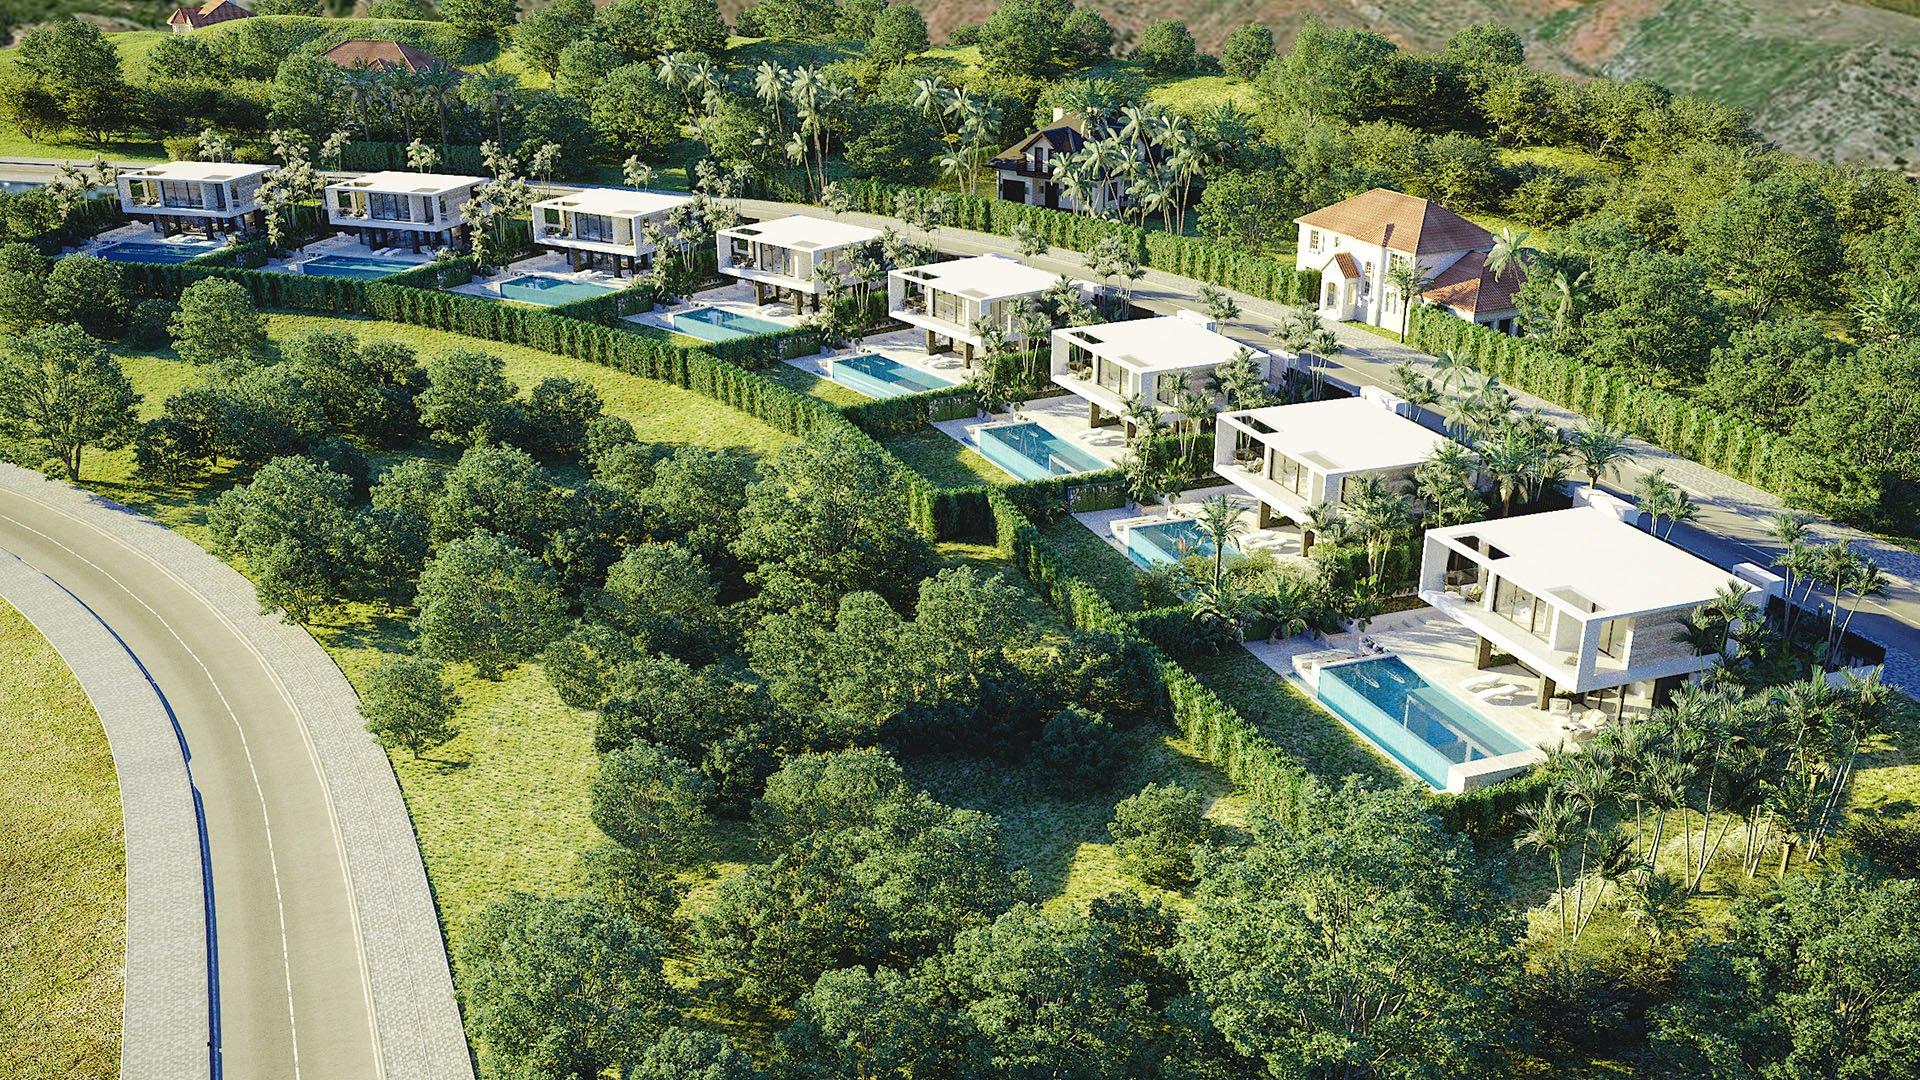 Valle Romano Green: Contemporary villas in Valle Romana Golf resort – Estepona